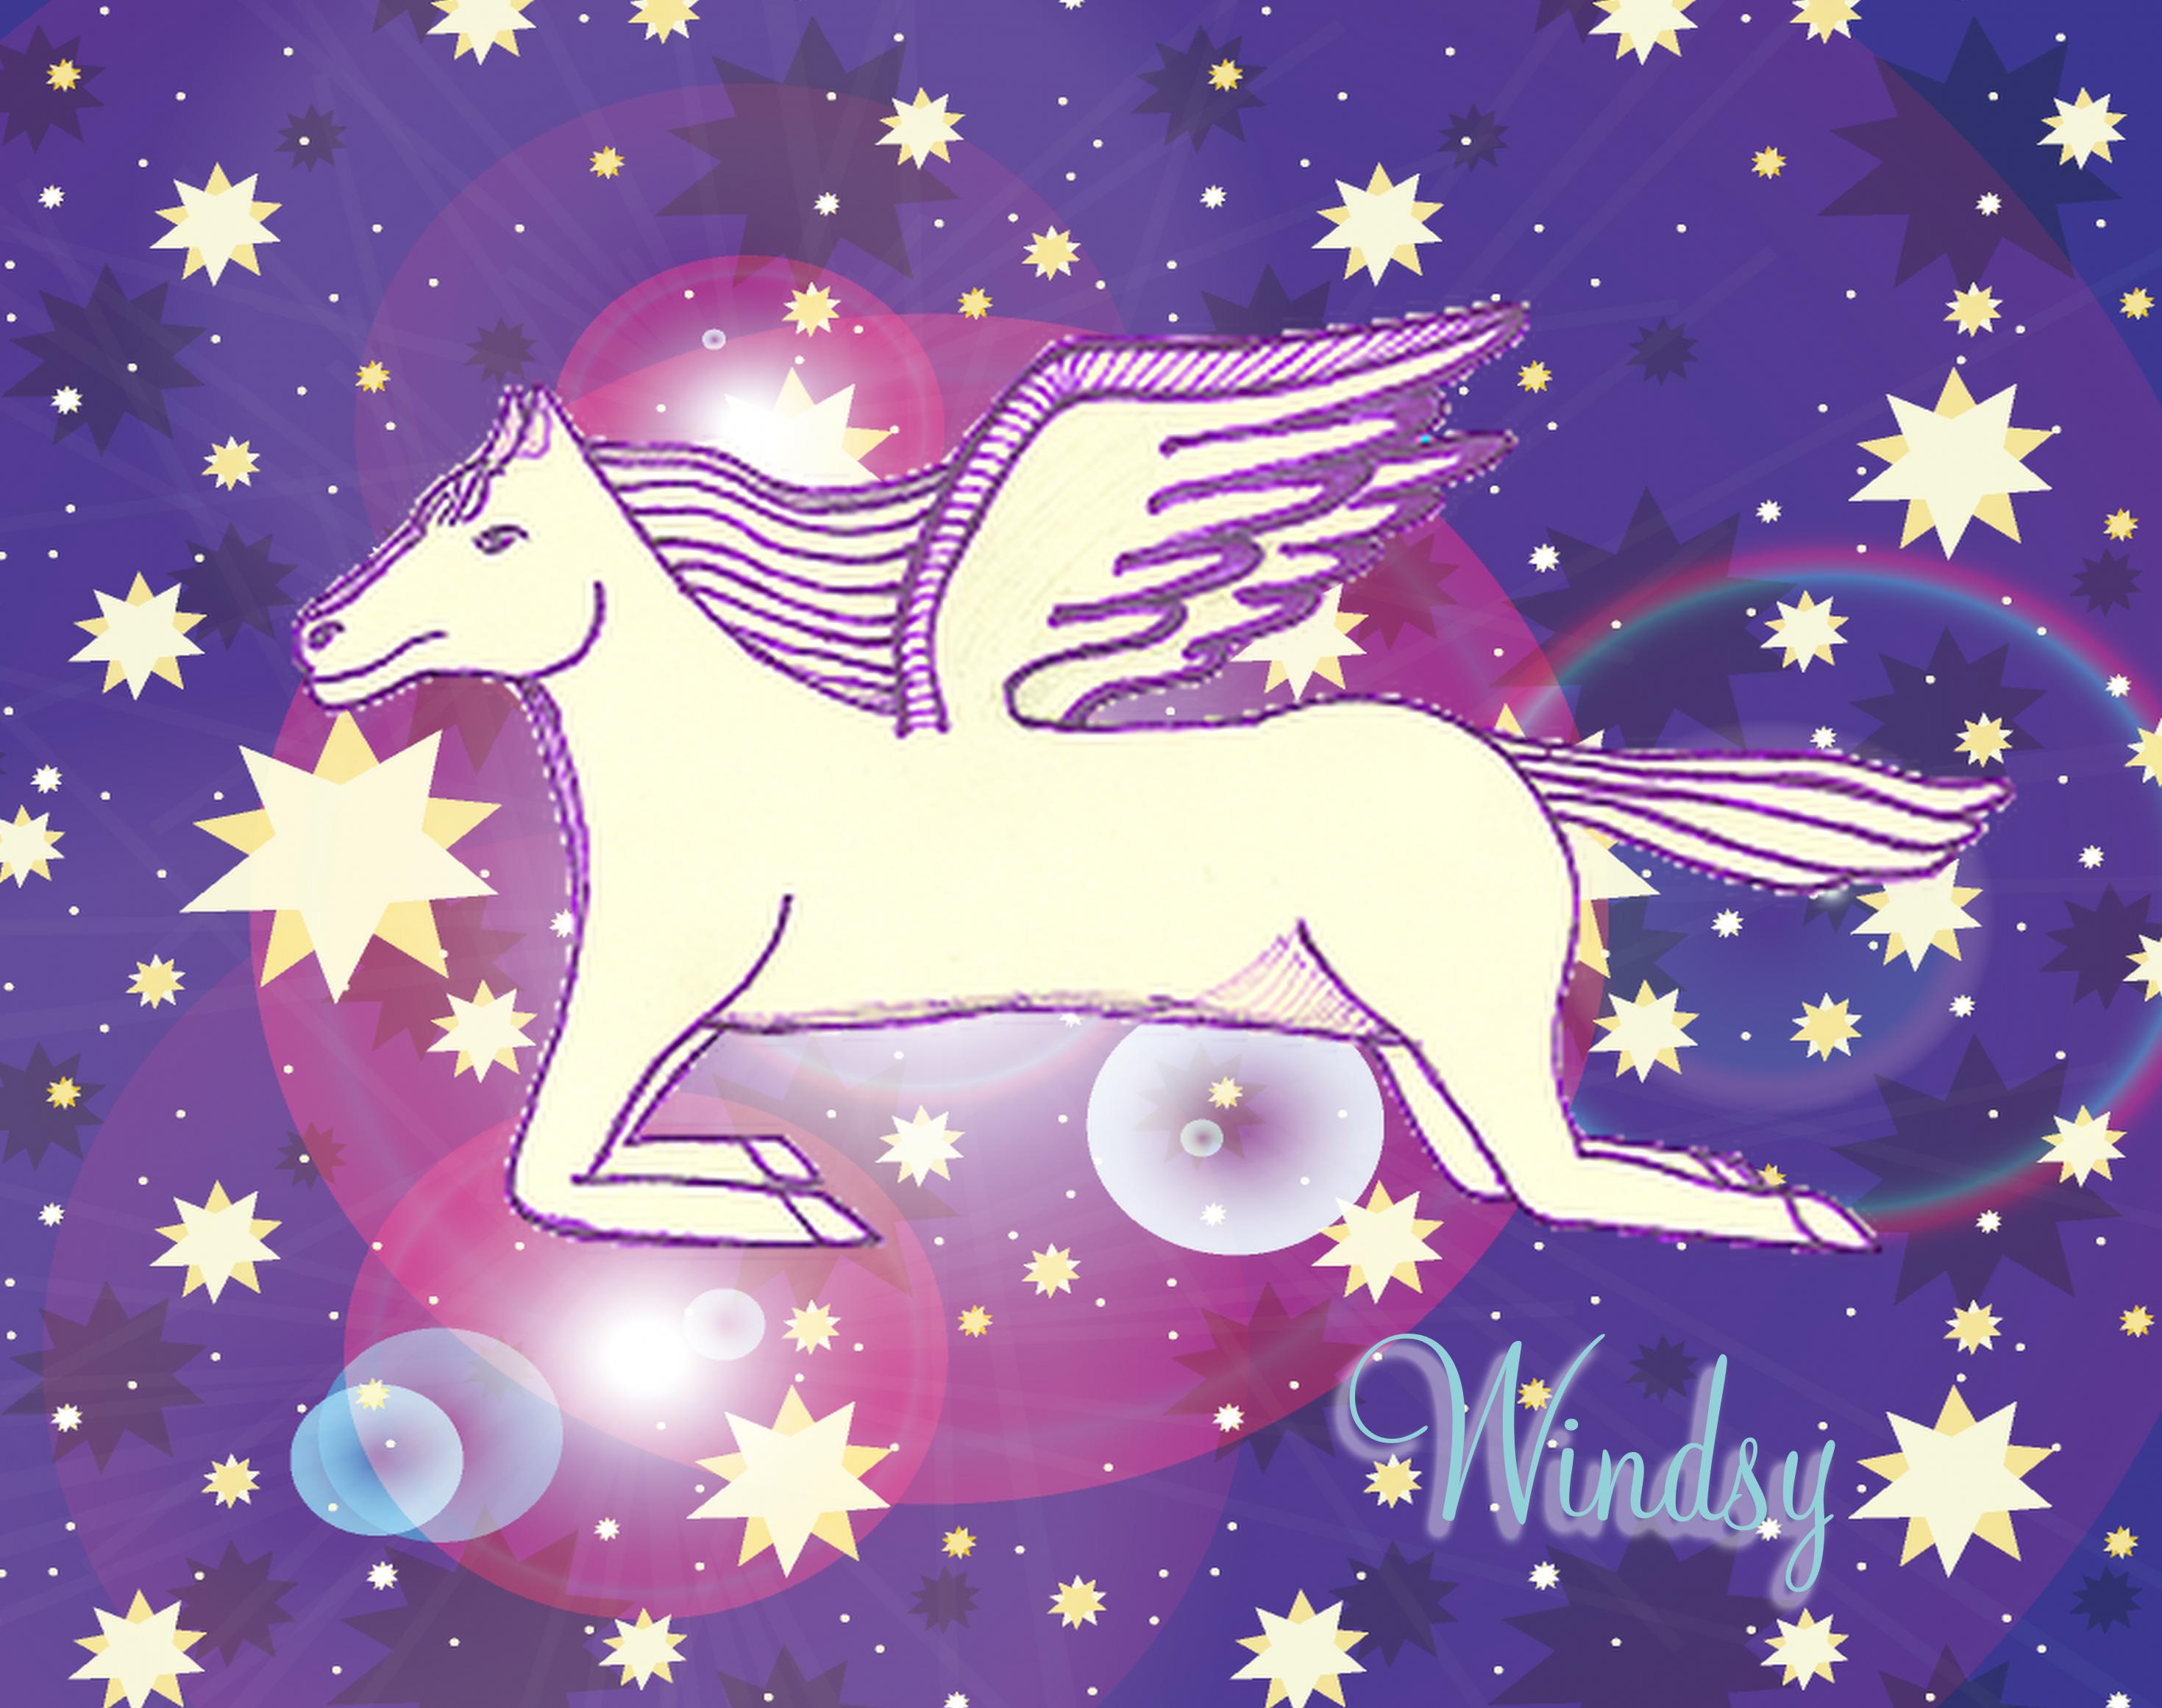 Windsy Cosmic Flight